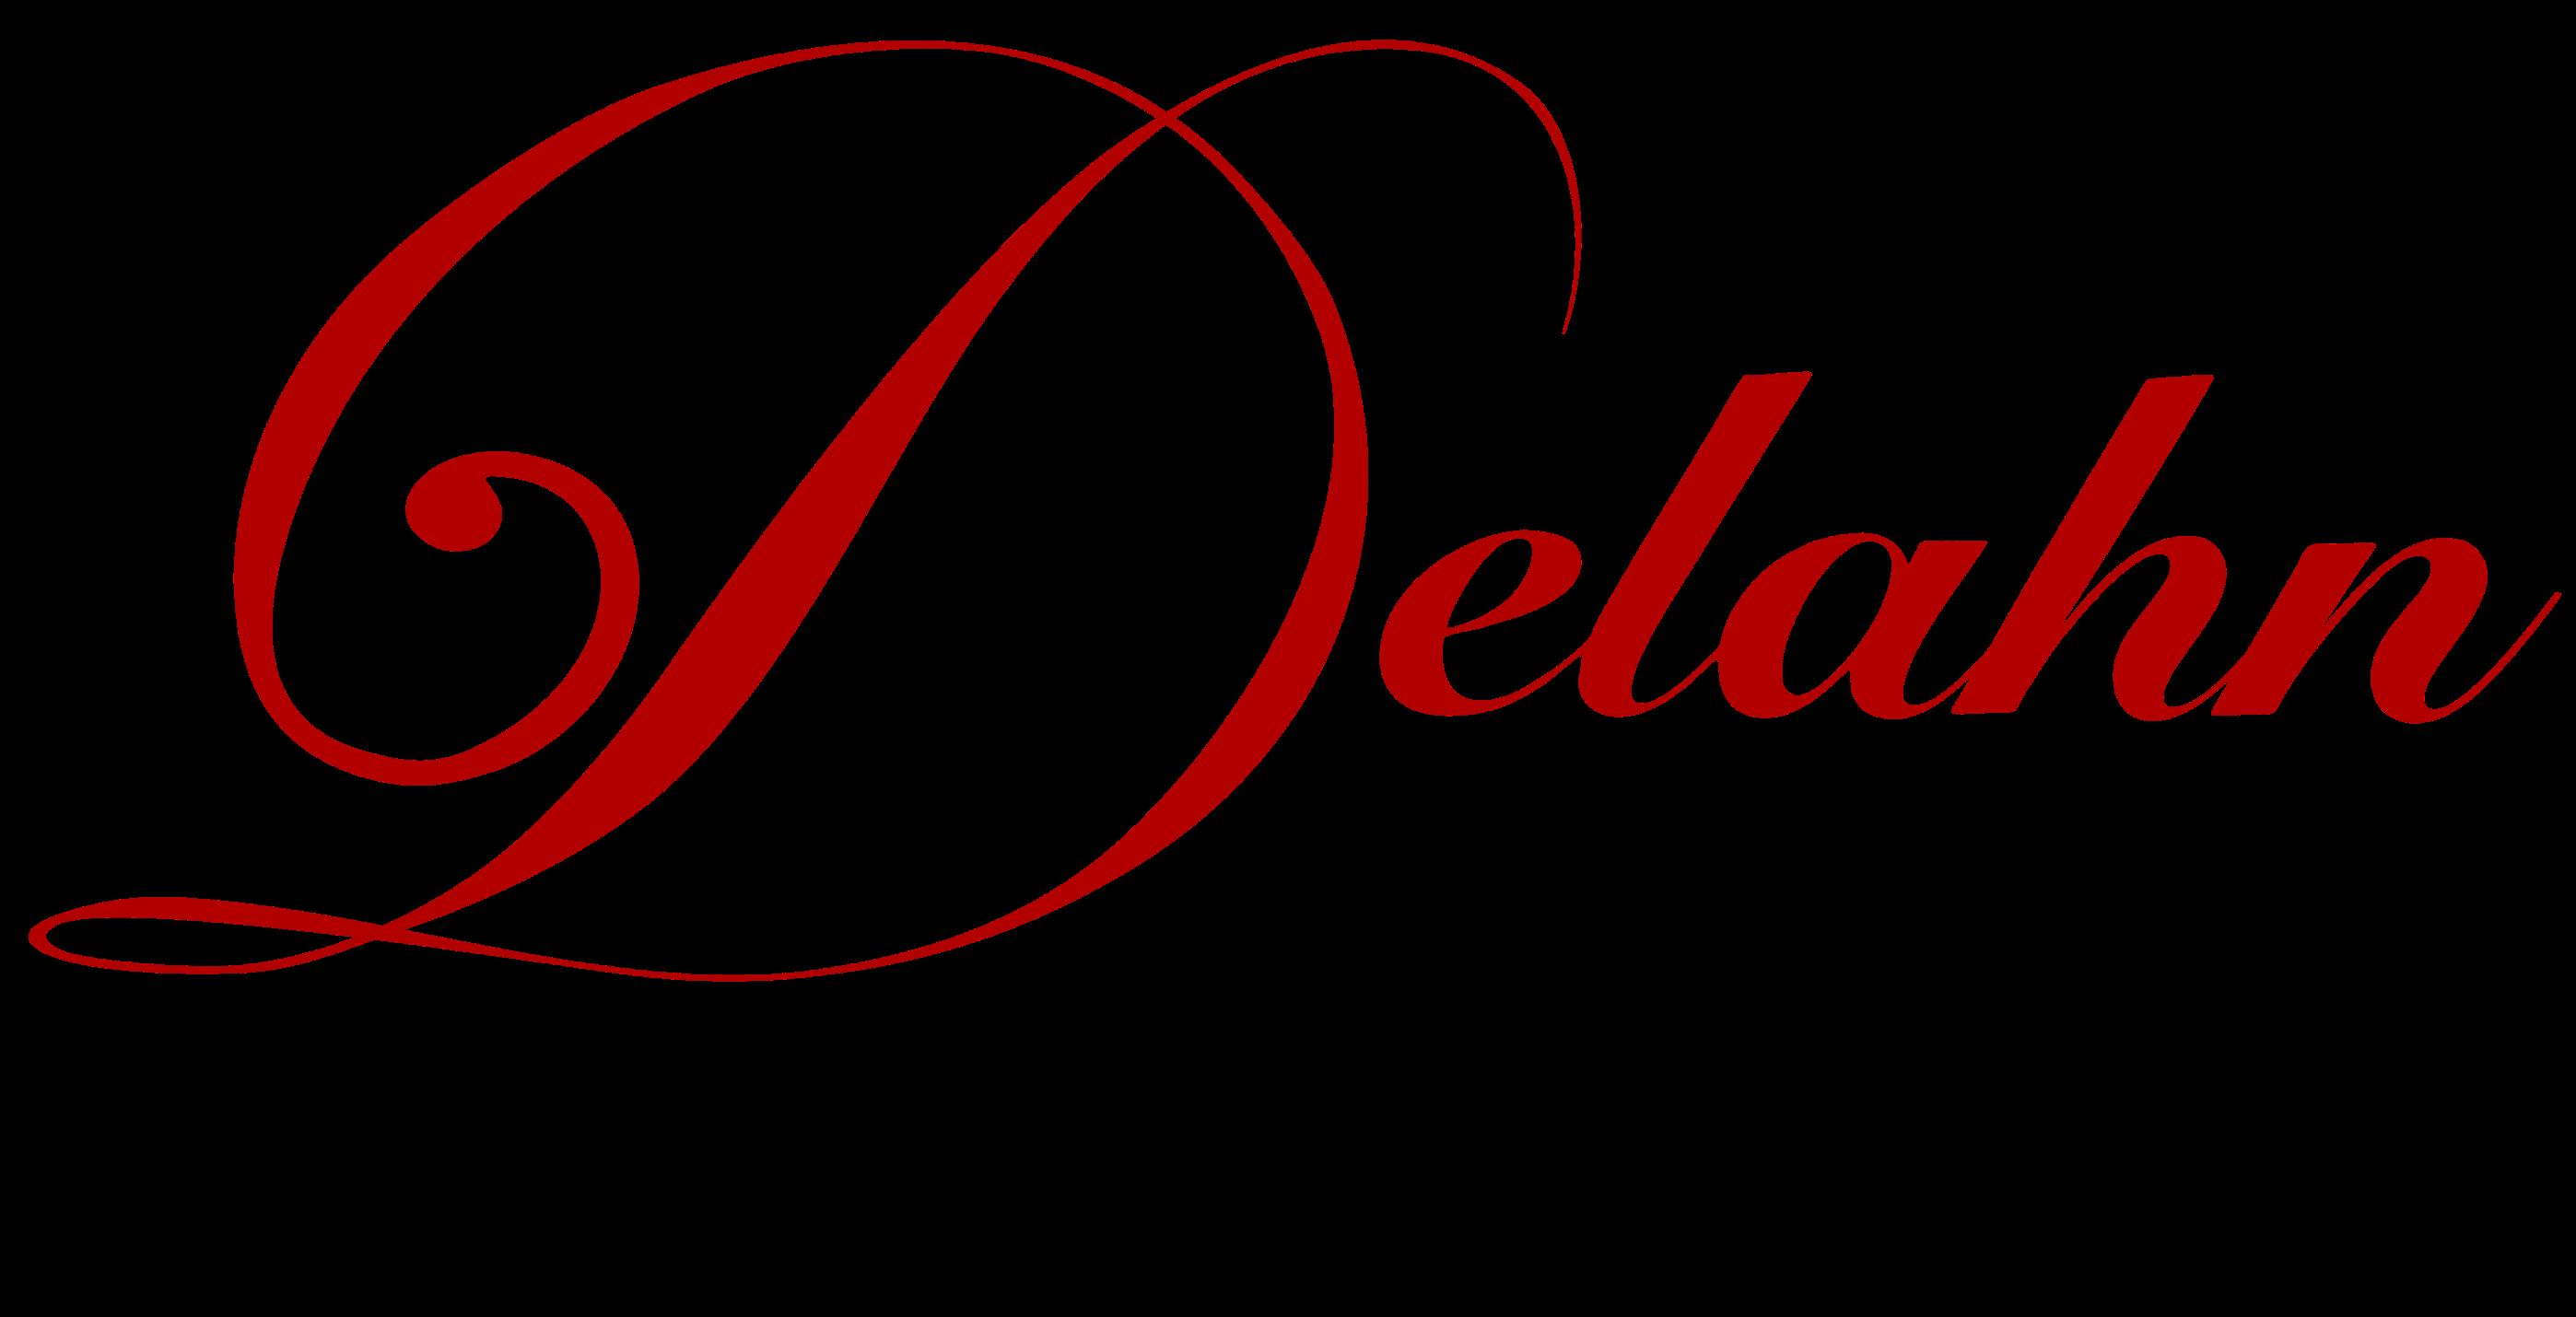 Delahn reality logo expanded  large size